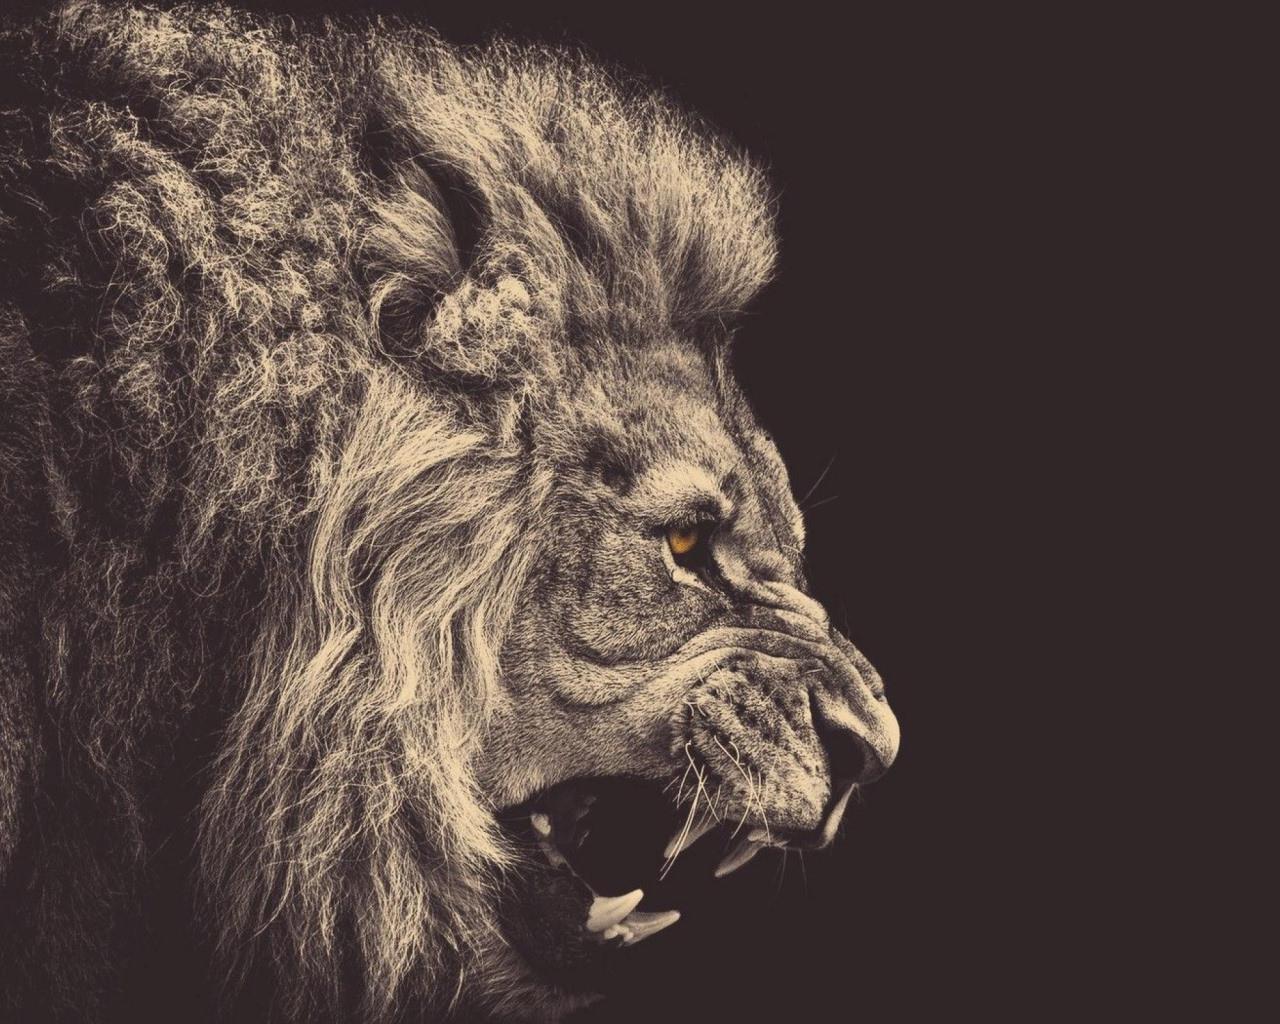 Ferocious Lion Wallpaper